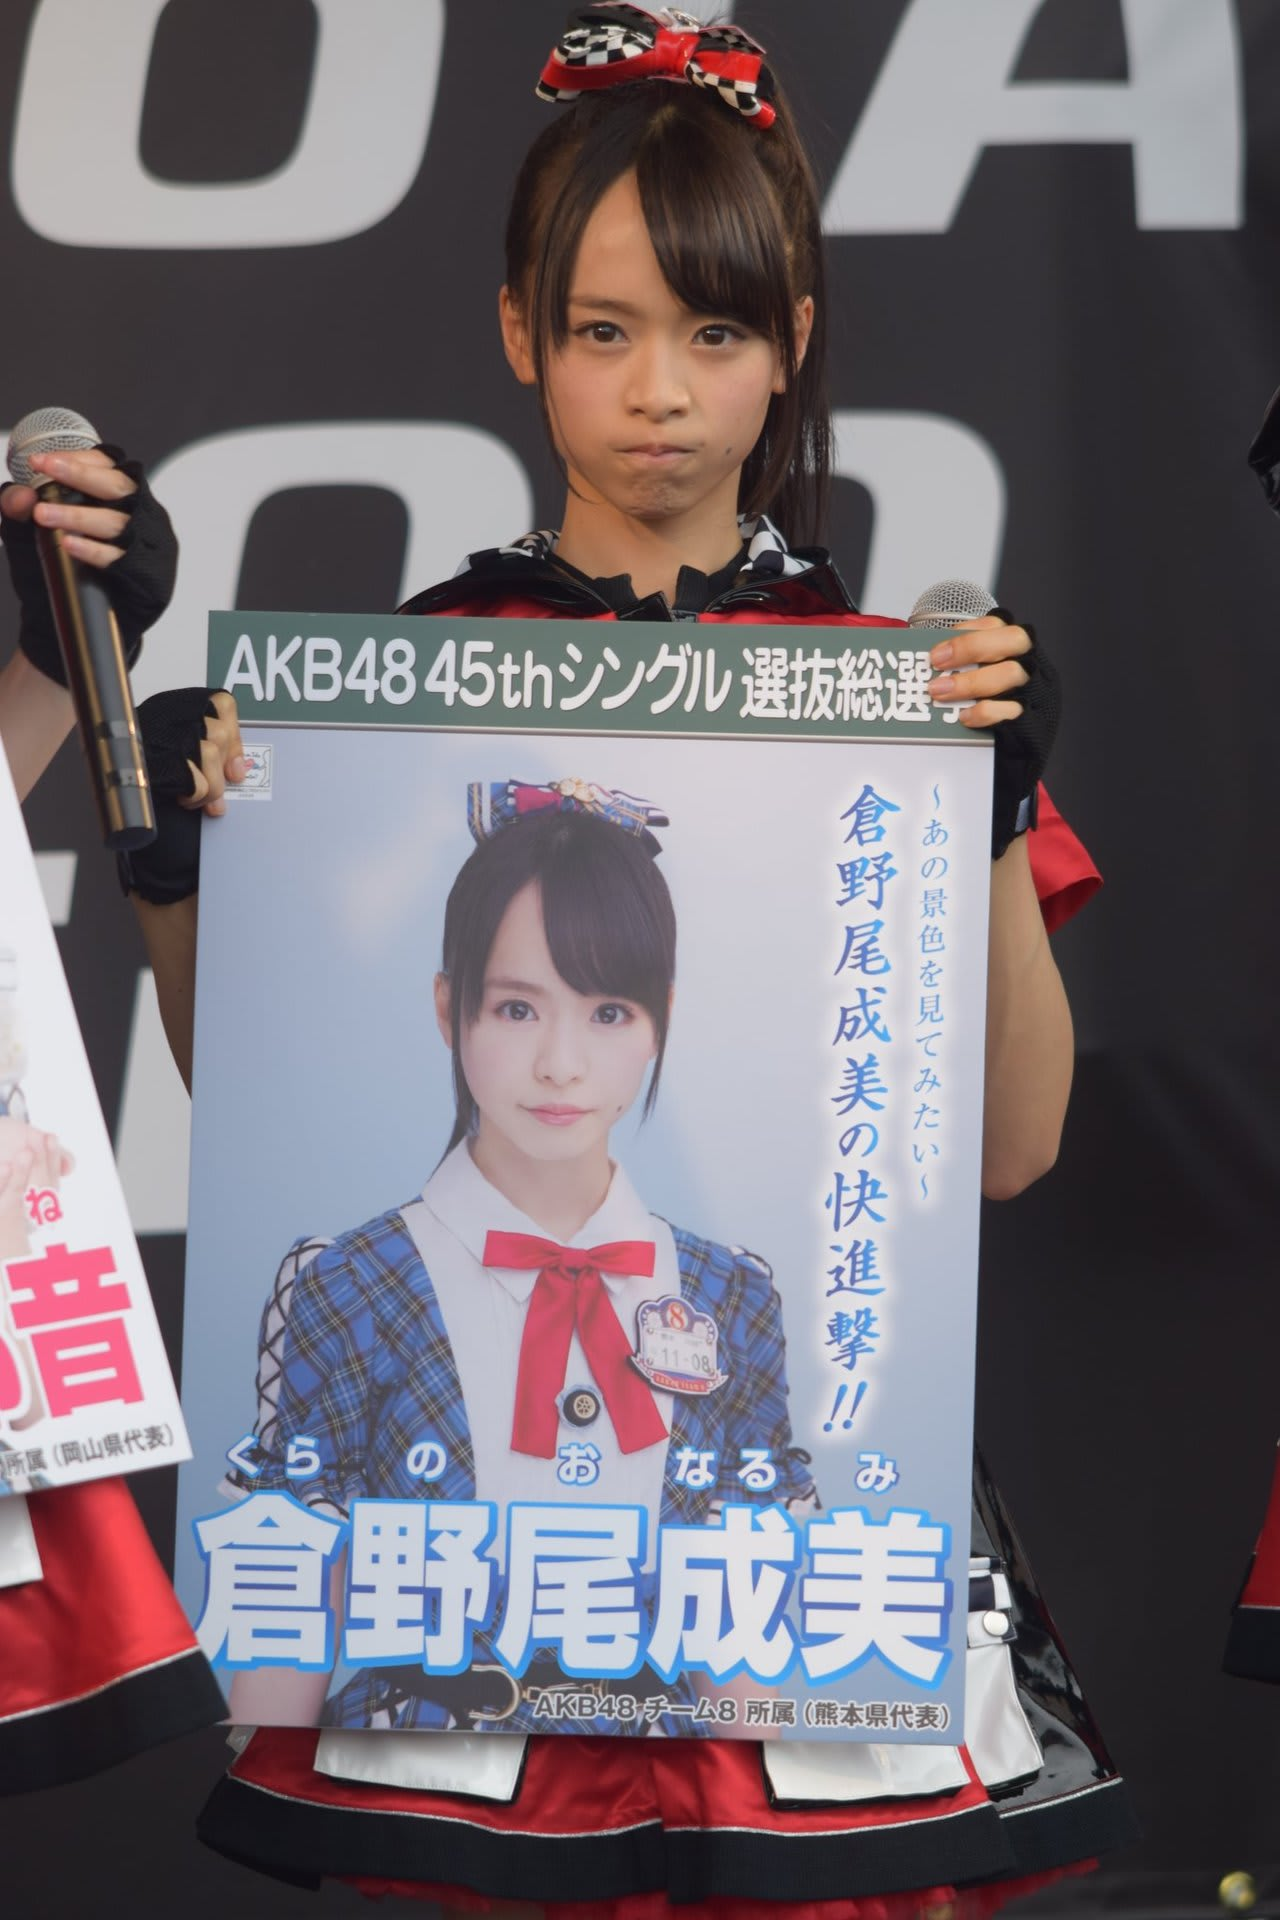 http://blogimg.goo.ne.jp/user_image/4d/4c/05dbd461d225e02b53cc58d236438d24.jpg